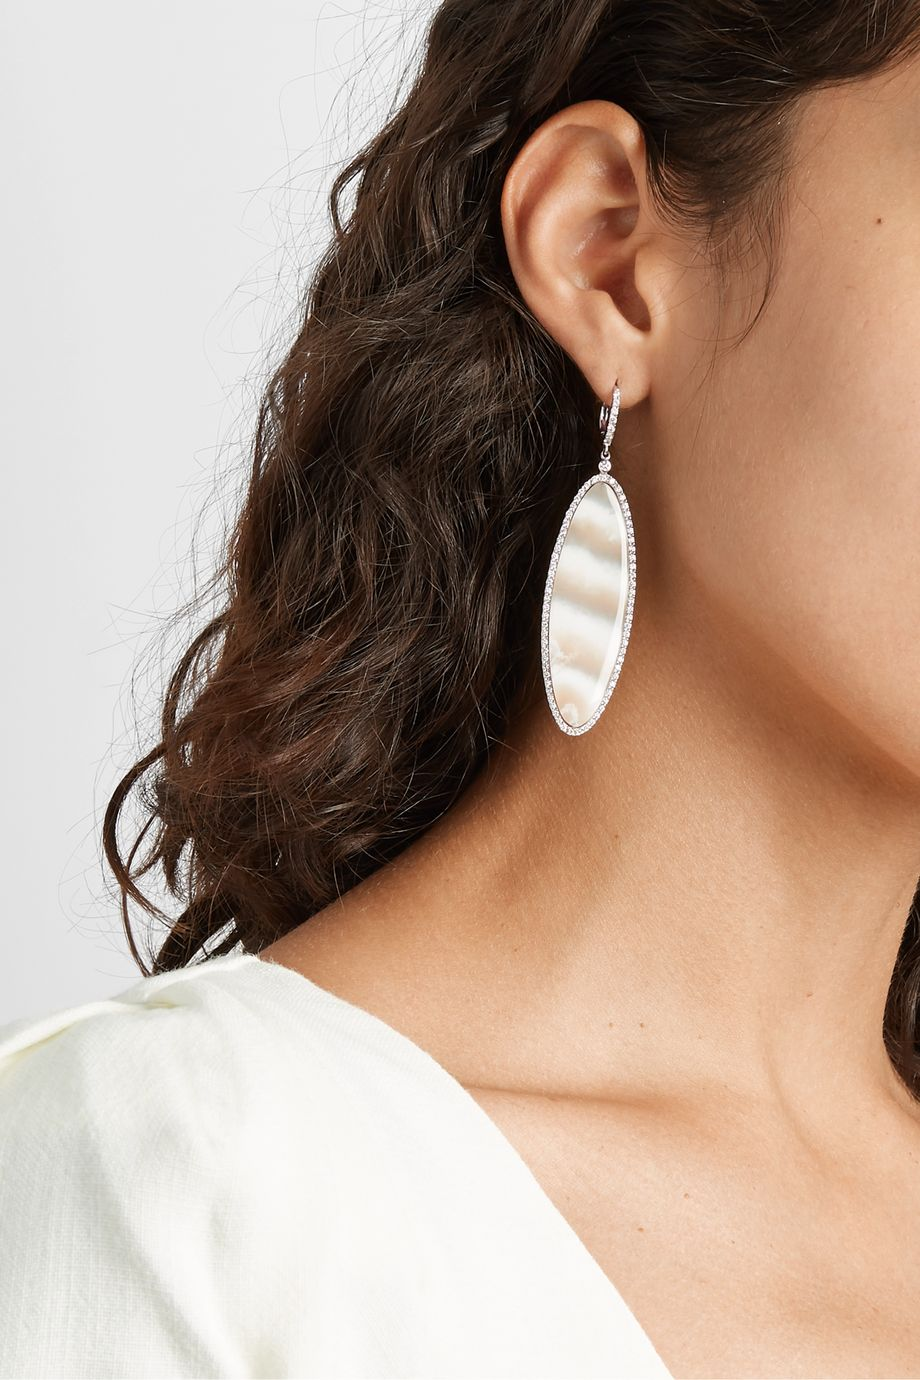 Kimberly McDonald 18-karat white gold, chalcedony and diamond earrings